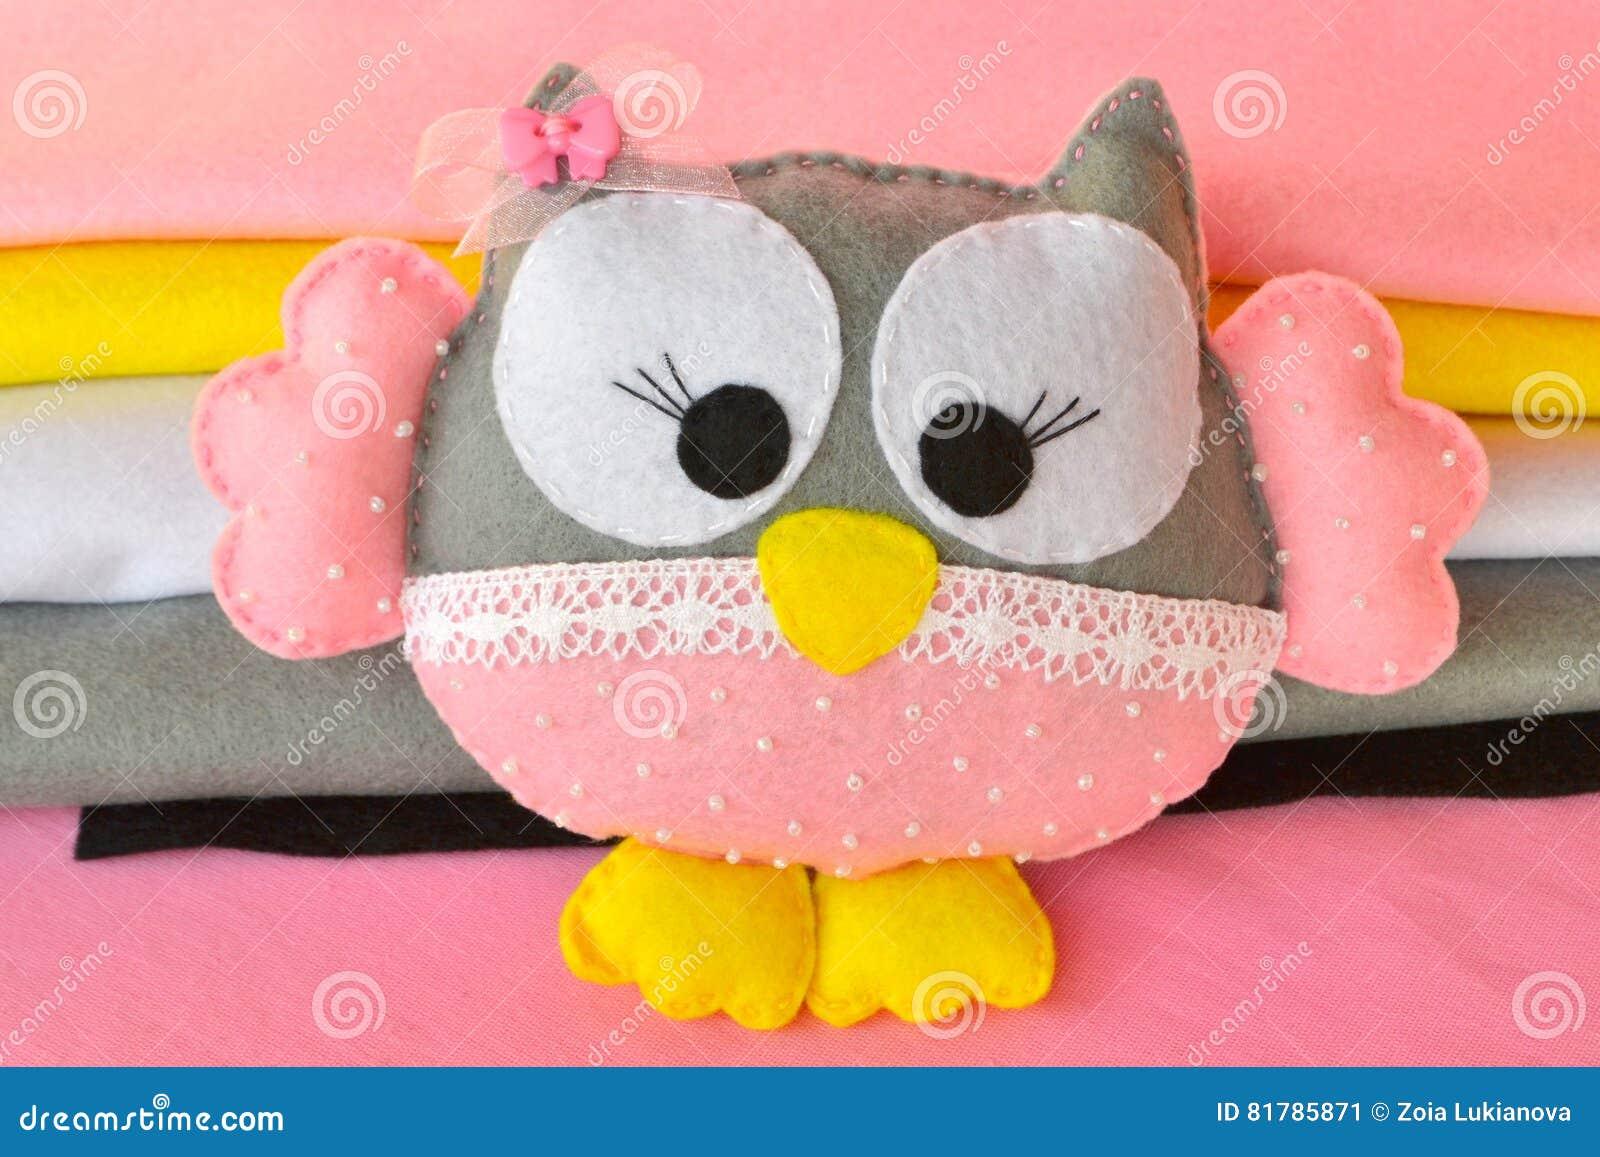 Felt Owl Cute Felt Owl Toy Home Decor Stock Image Image Of